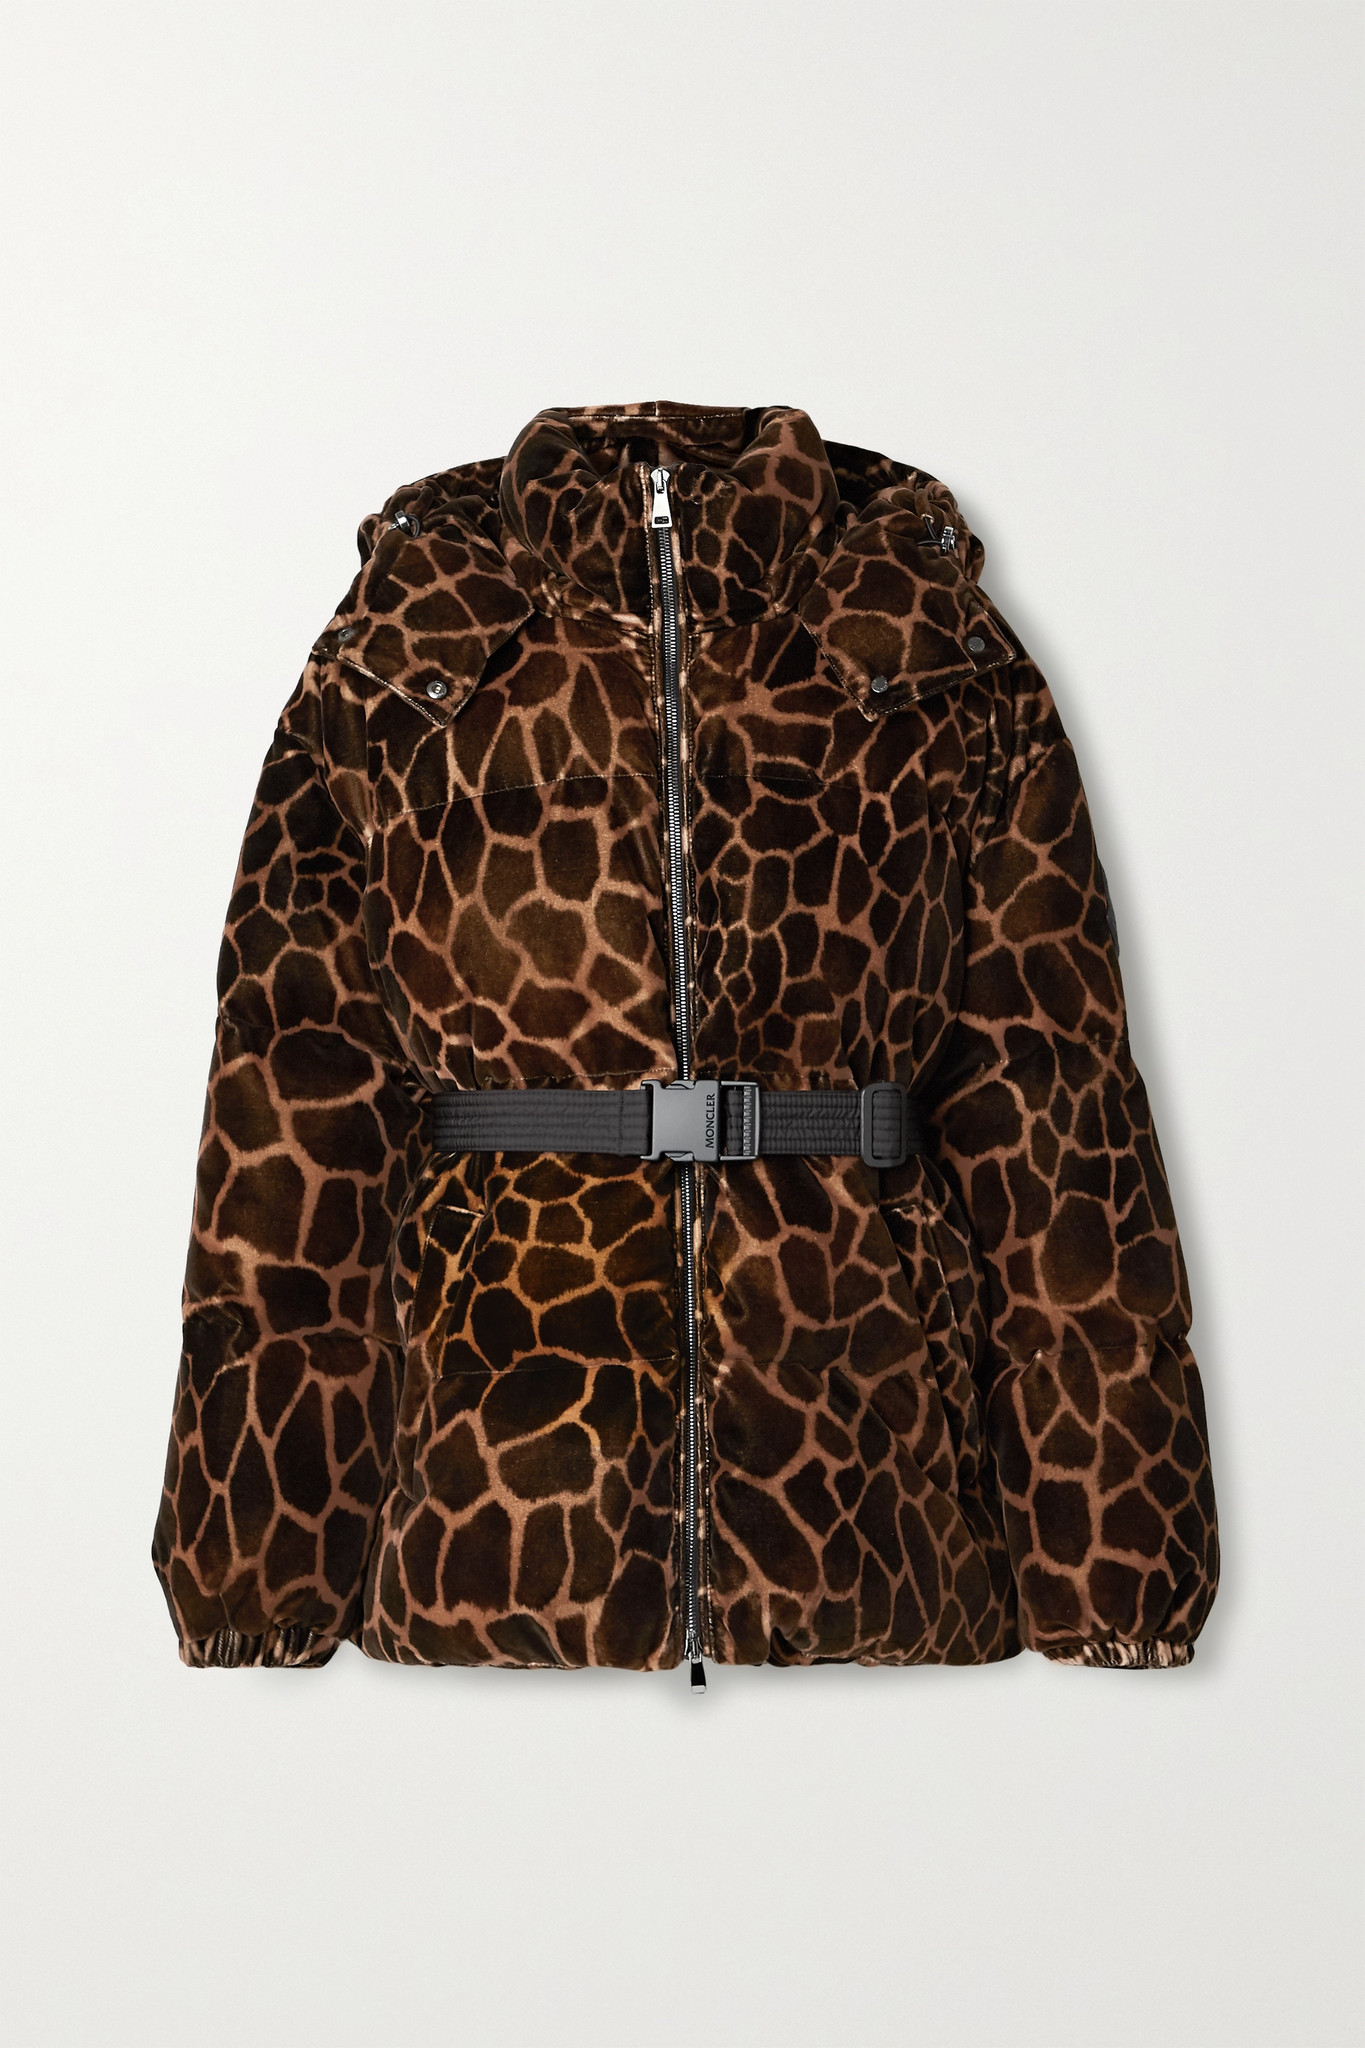 MONCLER - Kundogi Animal-print Quilted Cotton-velvet Down Jacket - Brown - 1